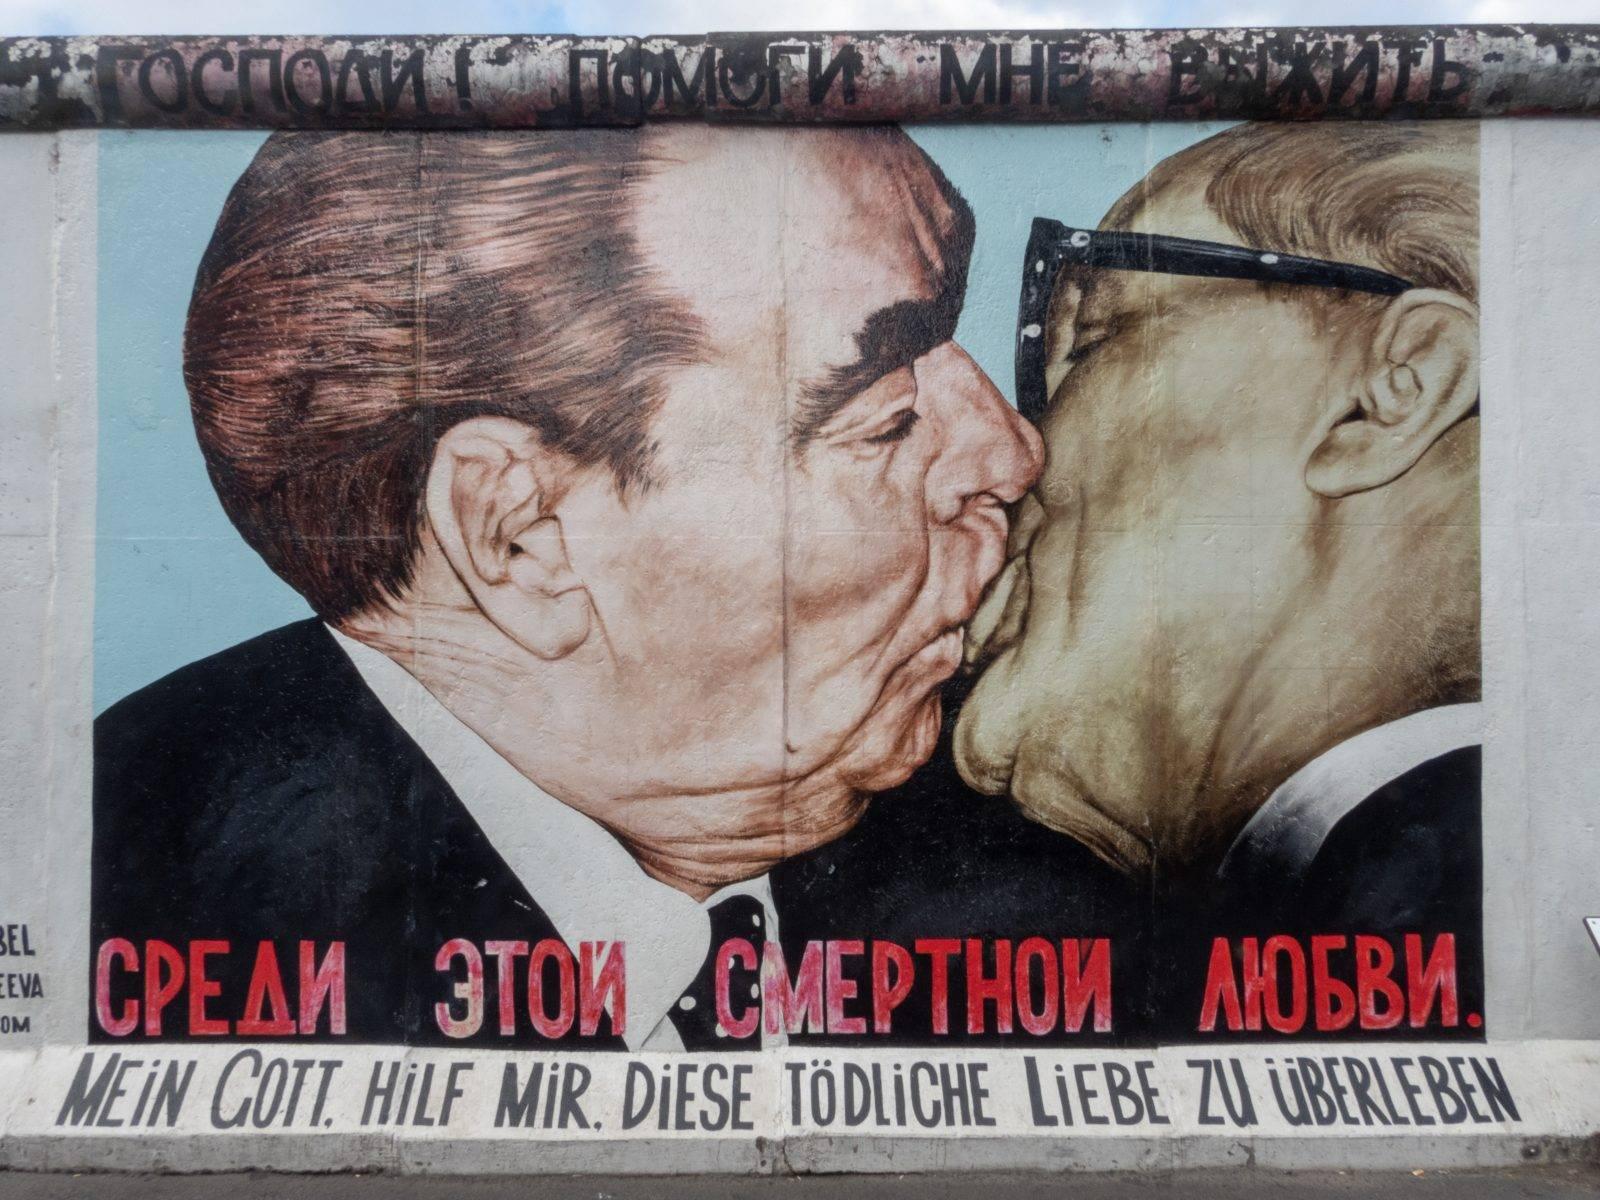 Nemzetközi konfliktusok a hidegháború idején